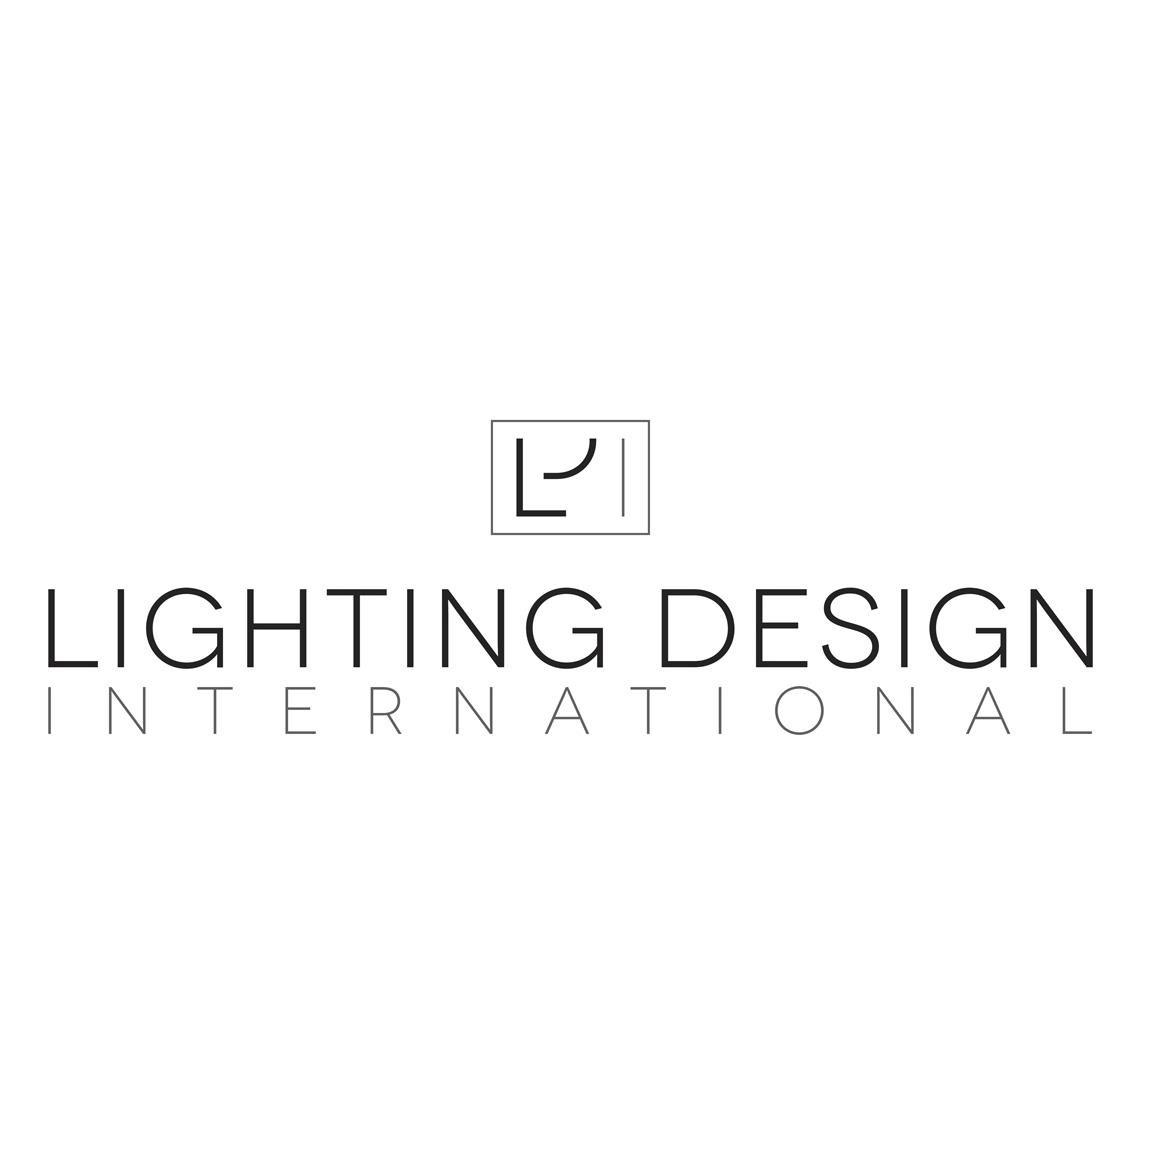 lighting design international